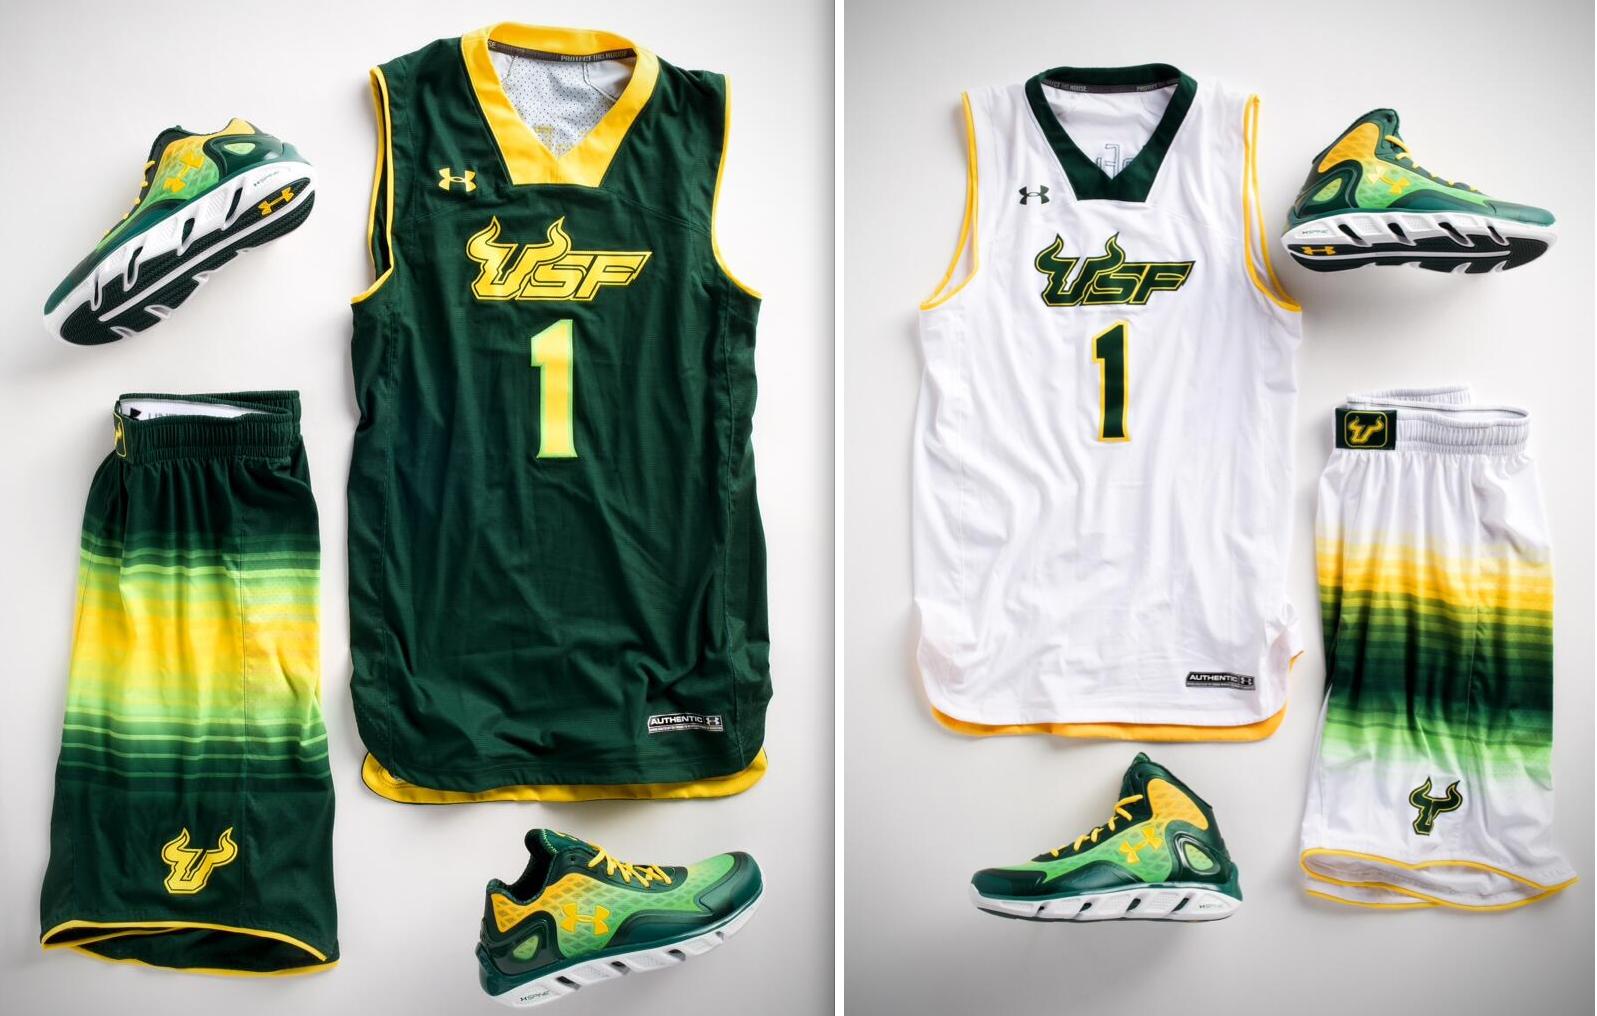 adidas basketball jersey designs 2013